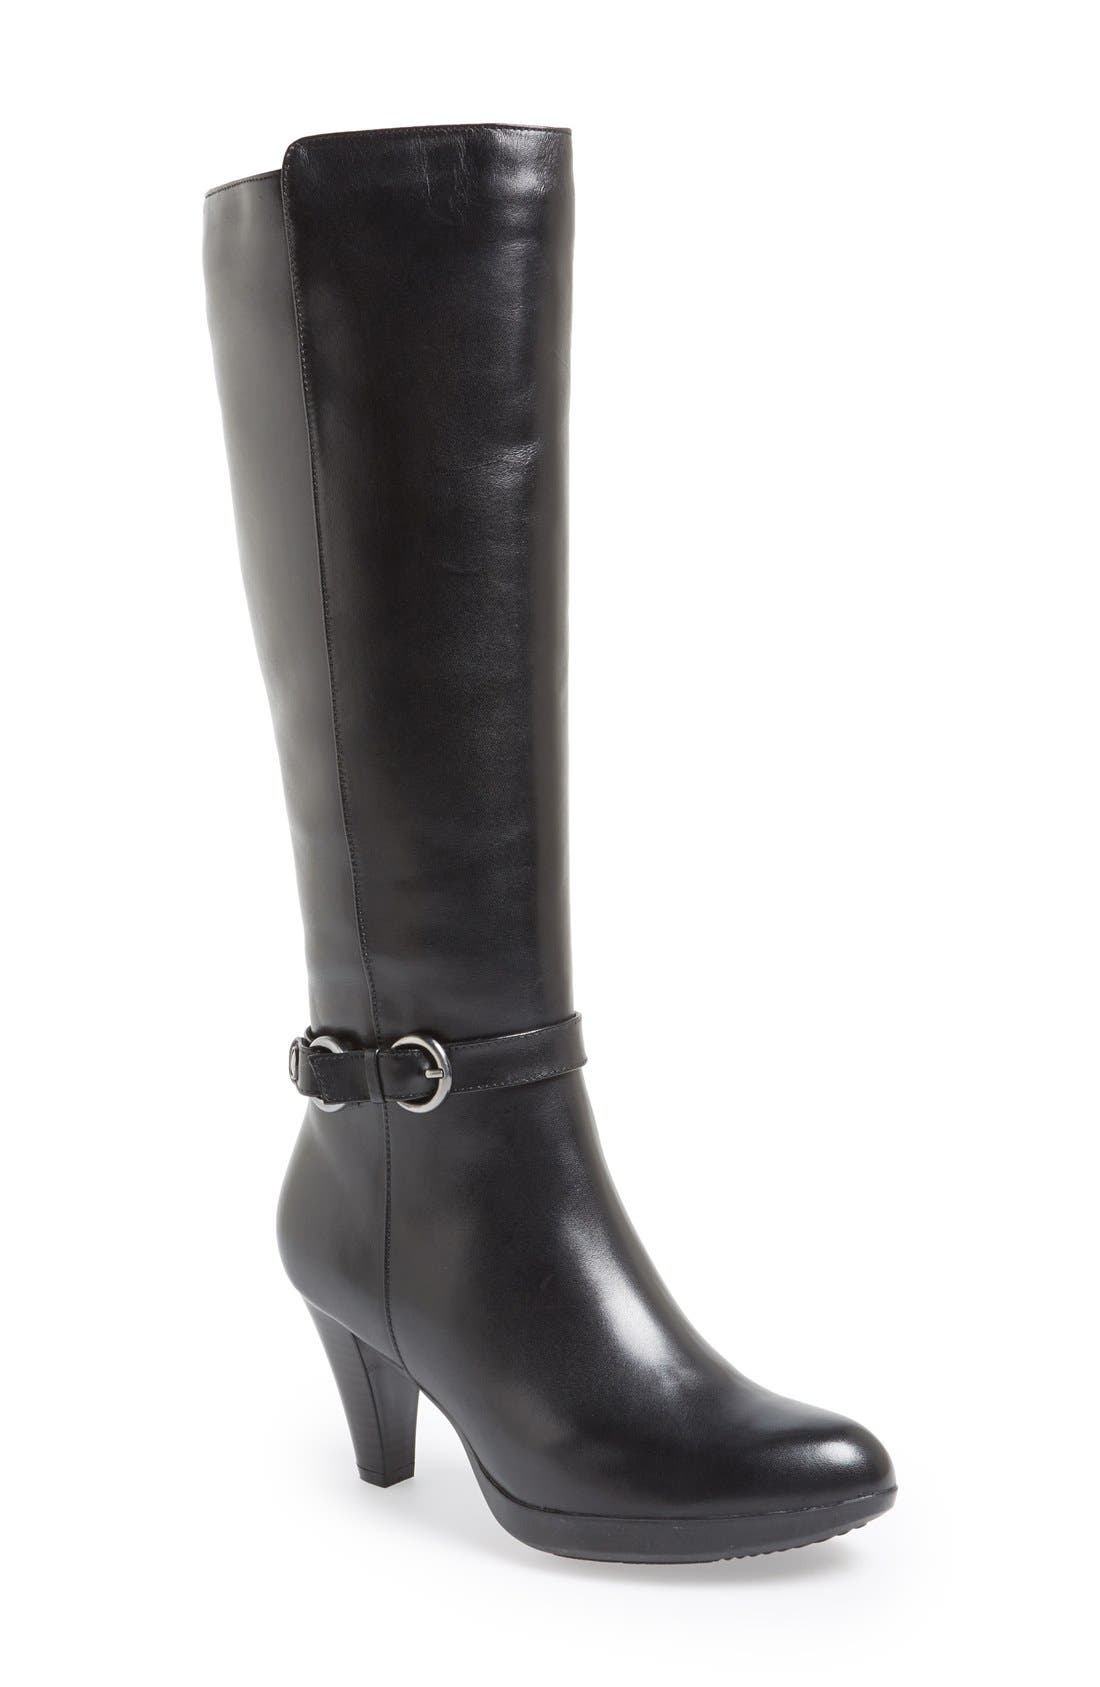 Alternate Image 1 Selected - Blondo 'Ilanna' Knee High Leather Boot (Women)